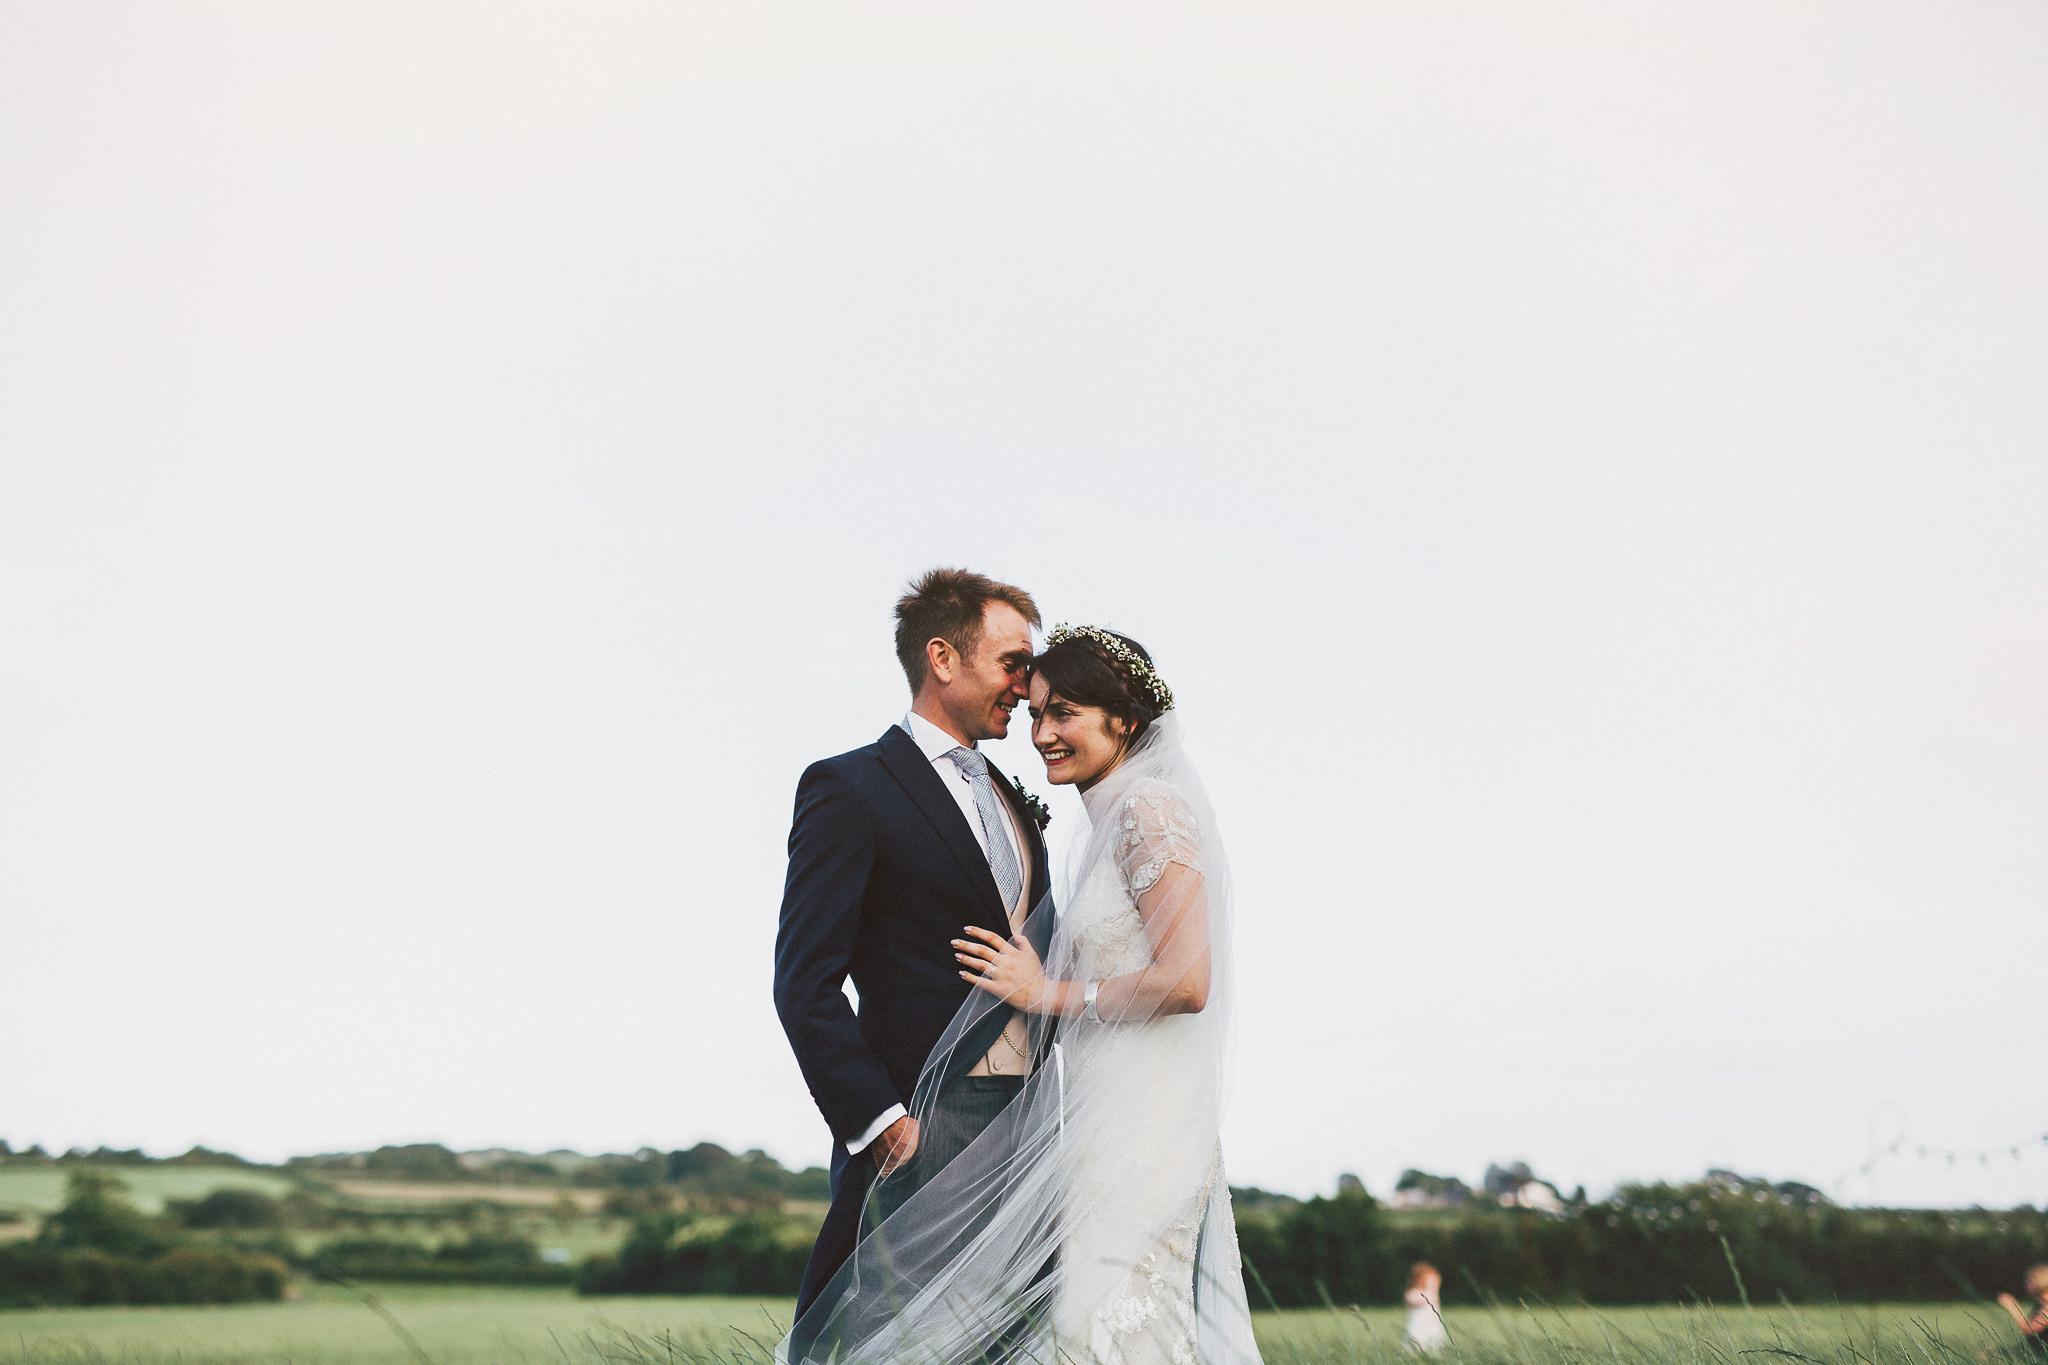 paul-marbrook-Farm-Wedding-Photographer-Lancashire-90065